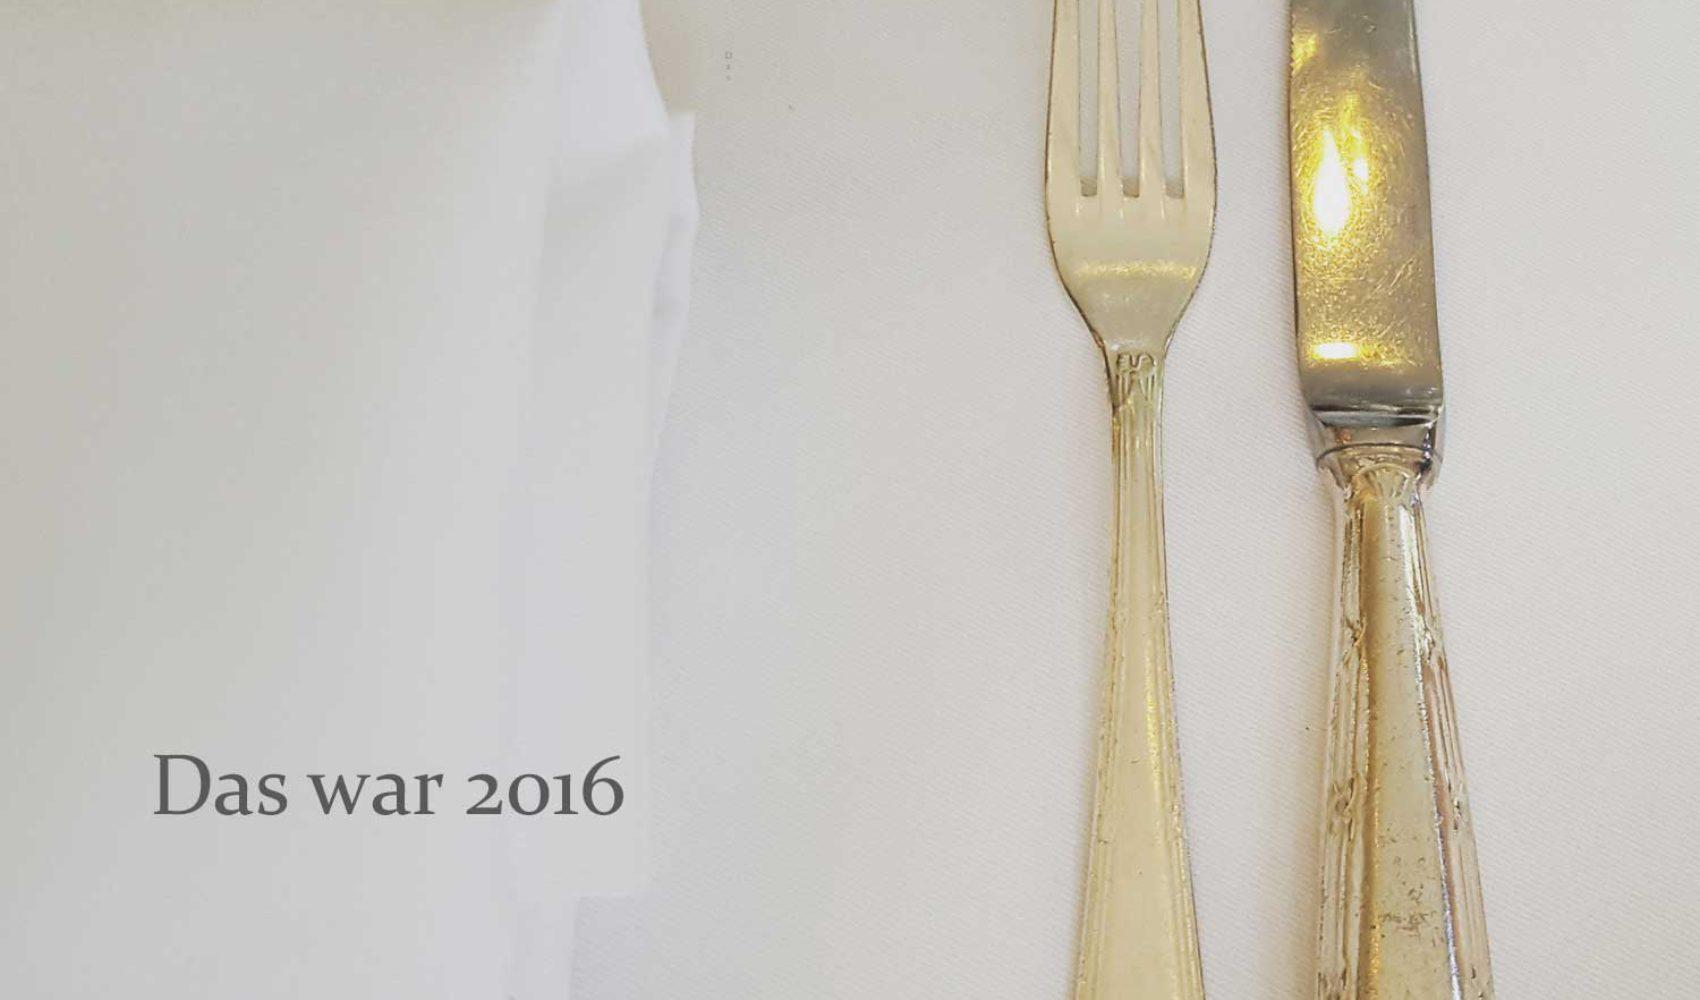 Jahresrückblick 2016 - EIN TOPF HEIMAT